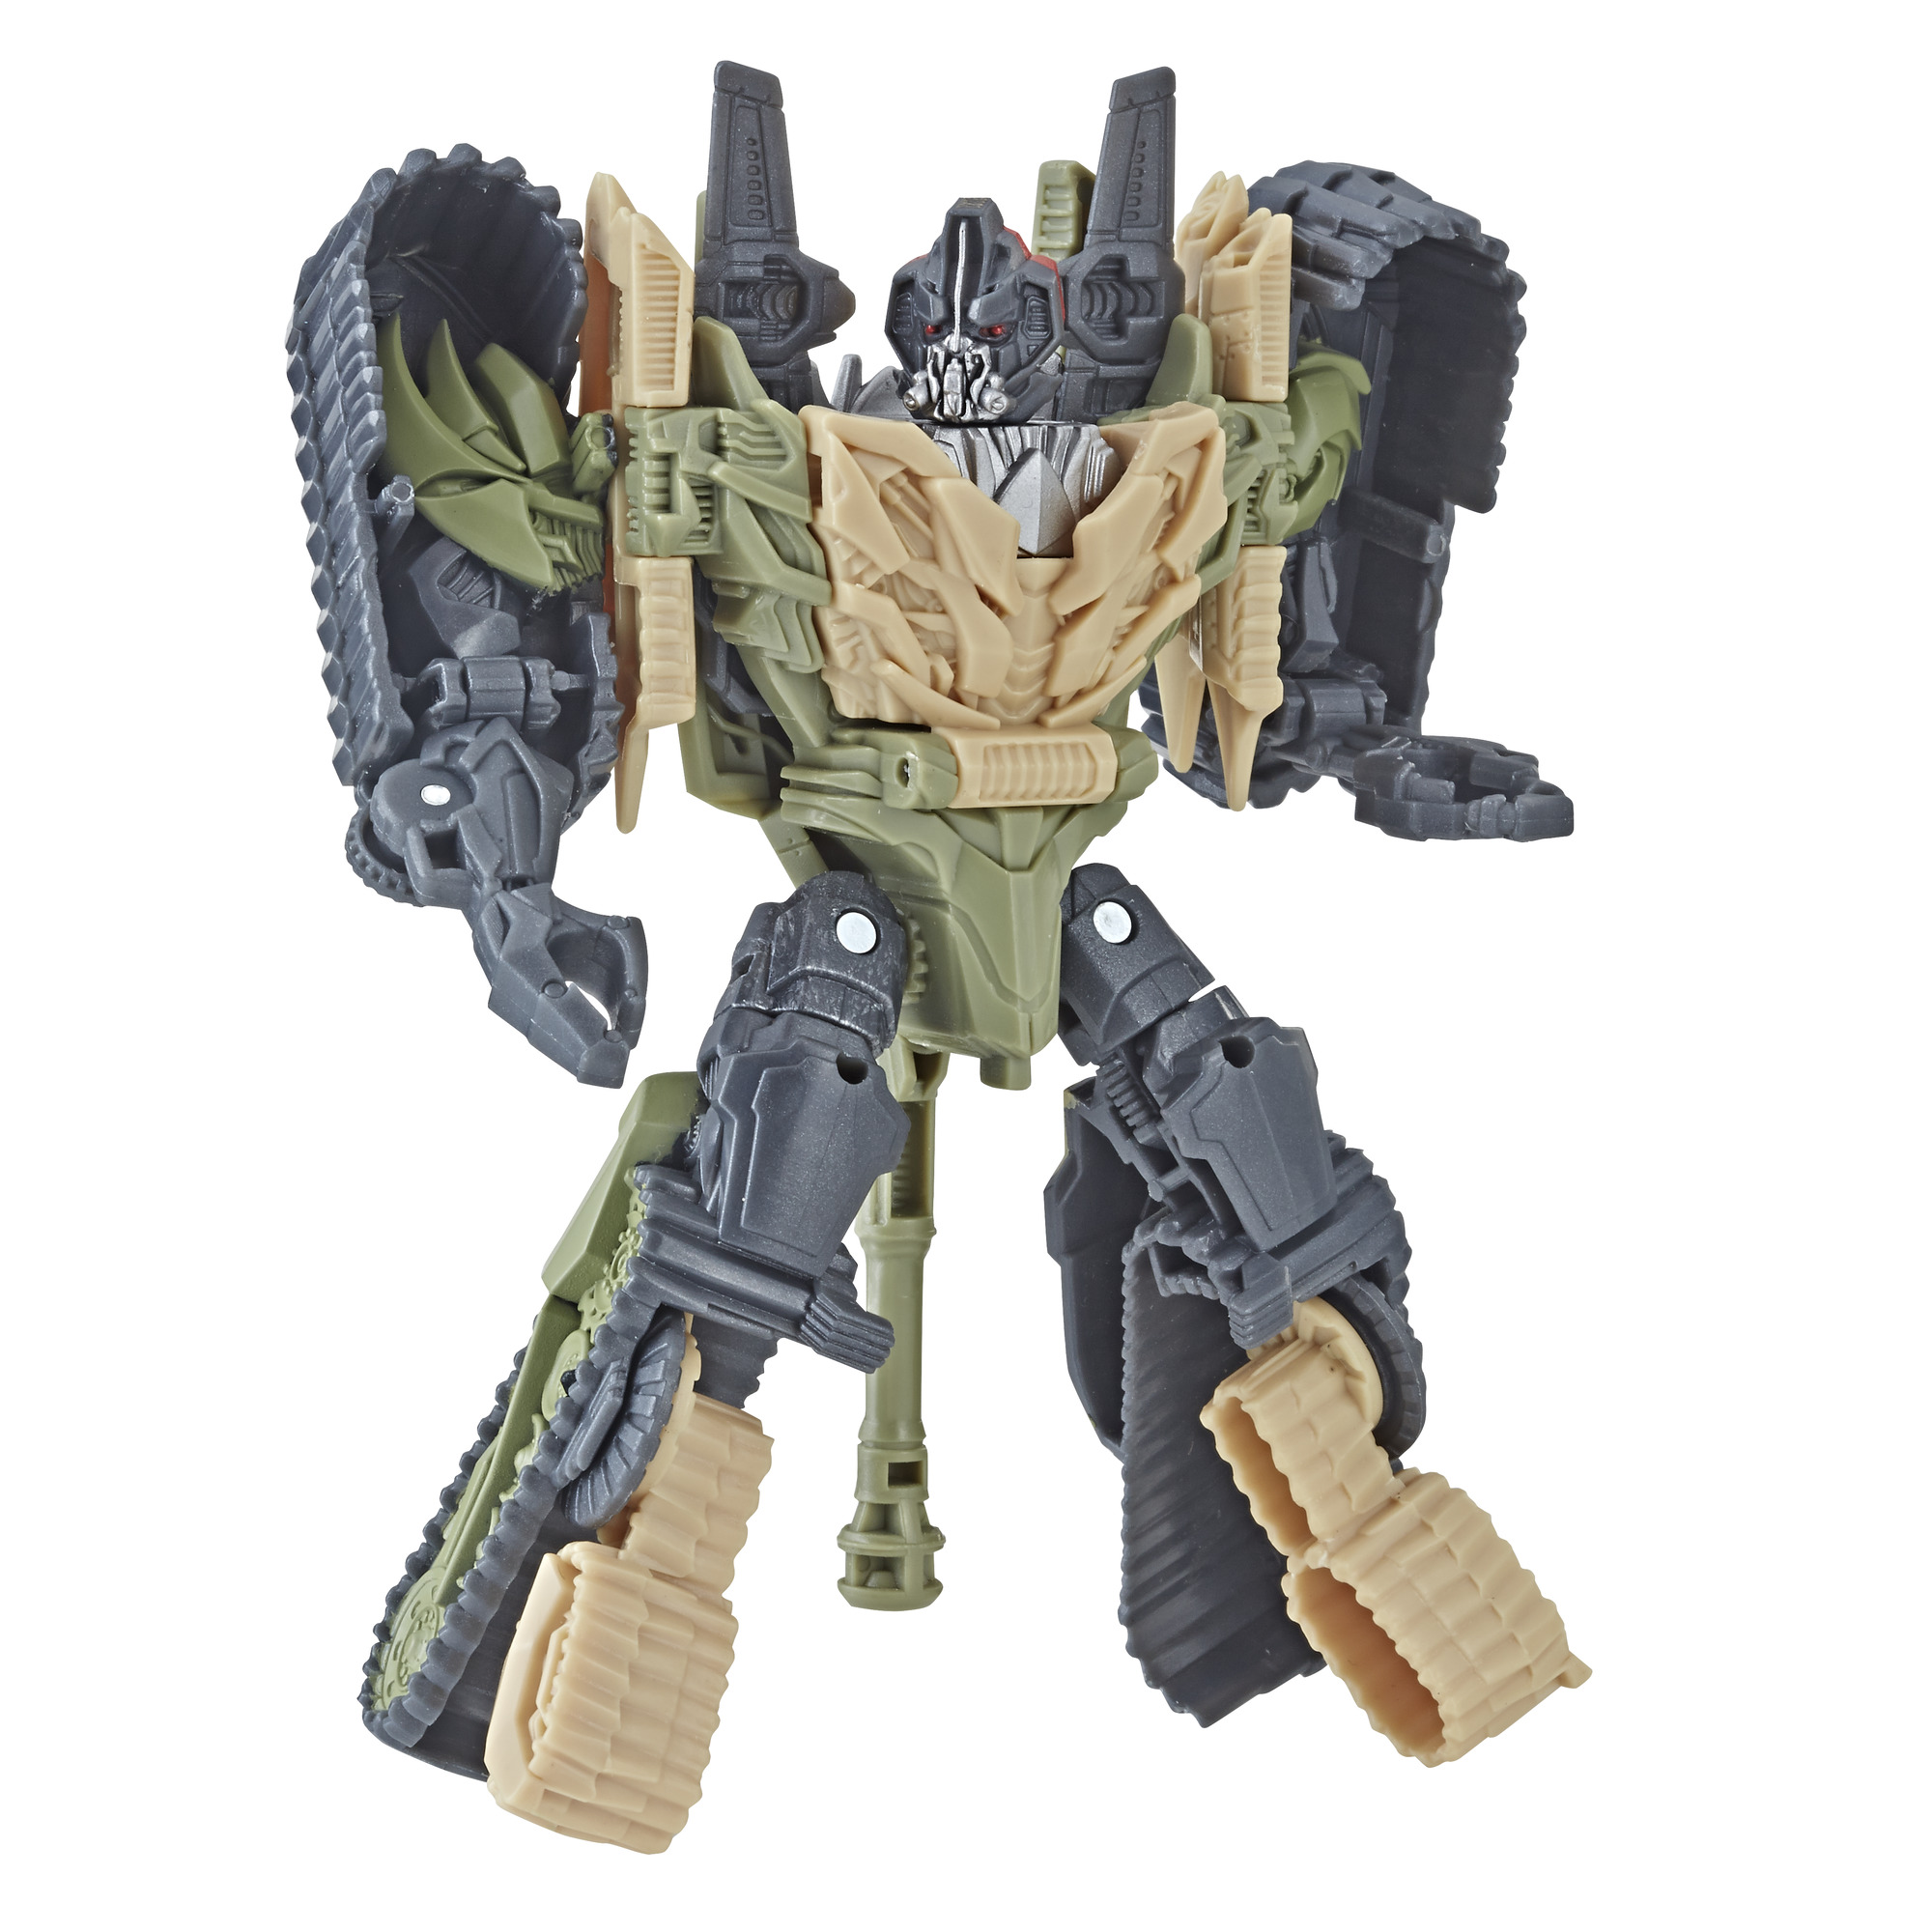 Hasbro Transformers Movie 6 Bumblebee Energon Igniters Power Basic Blitzwing